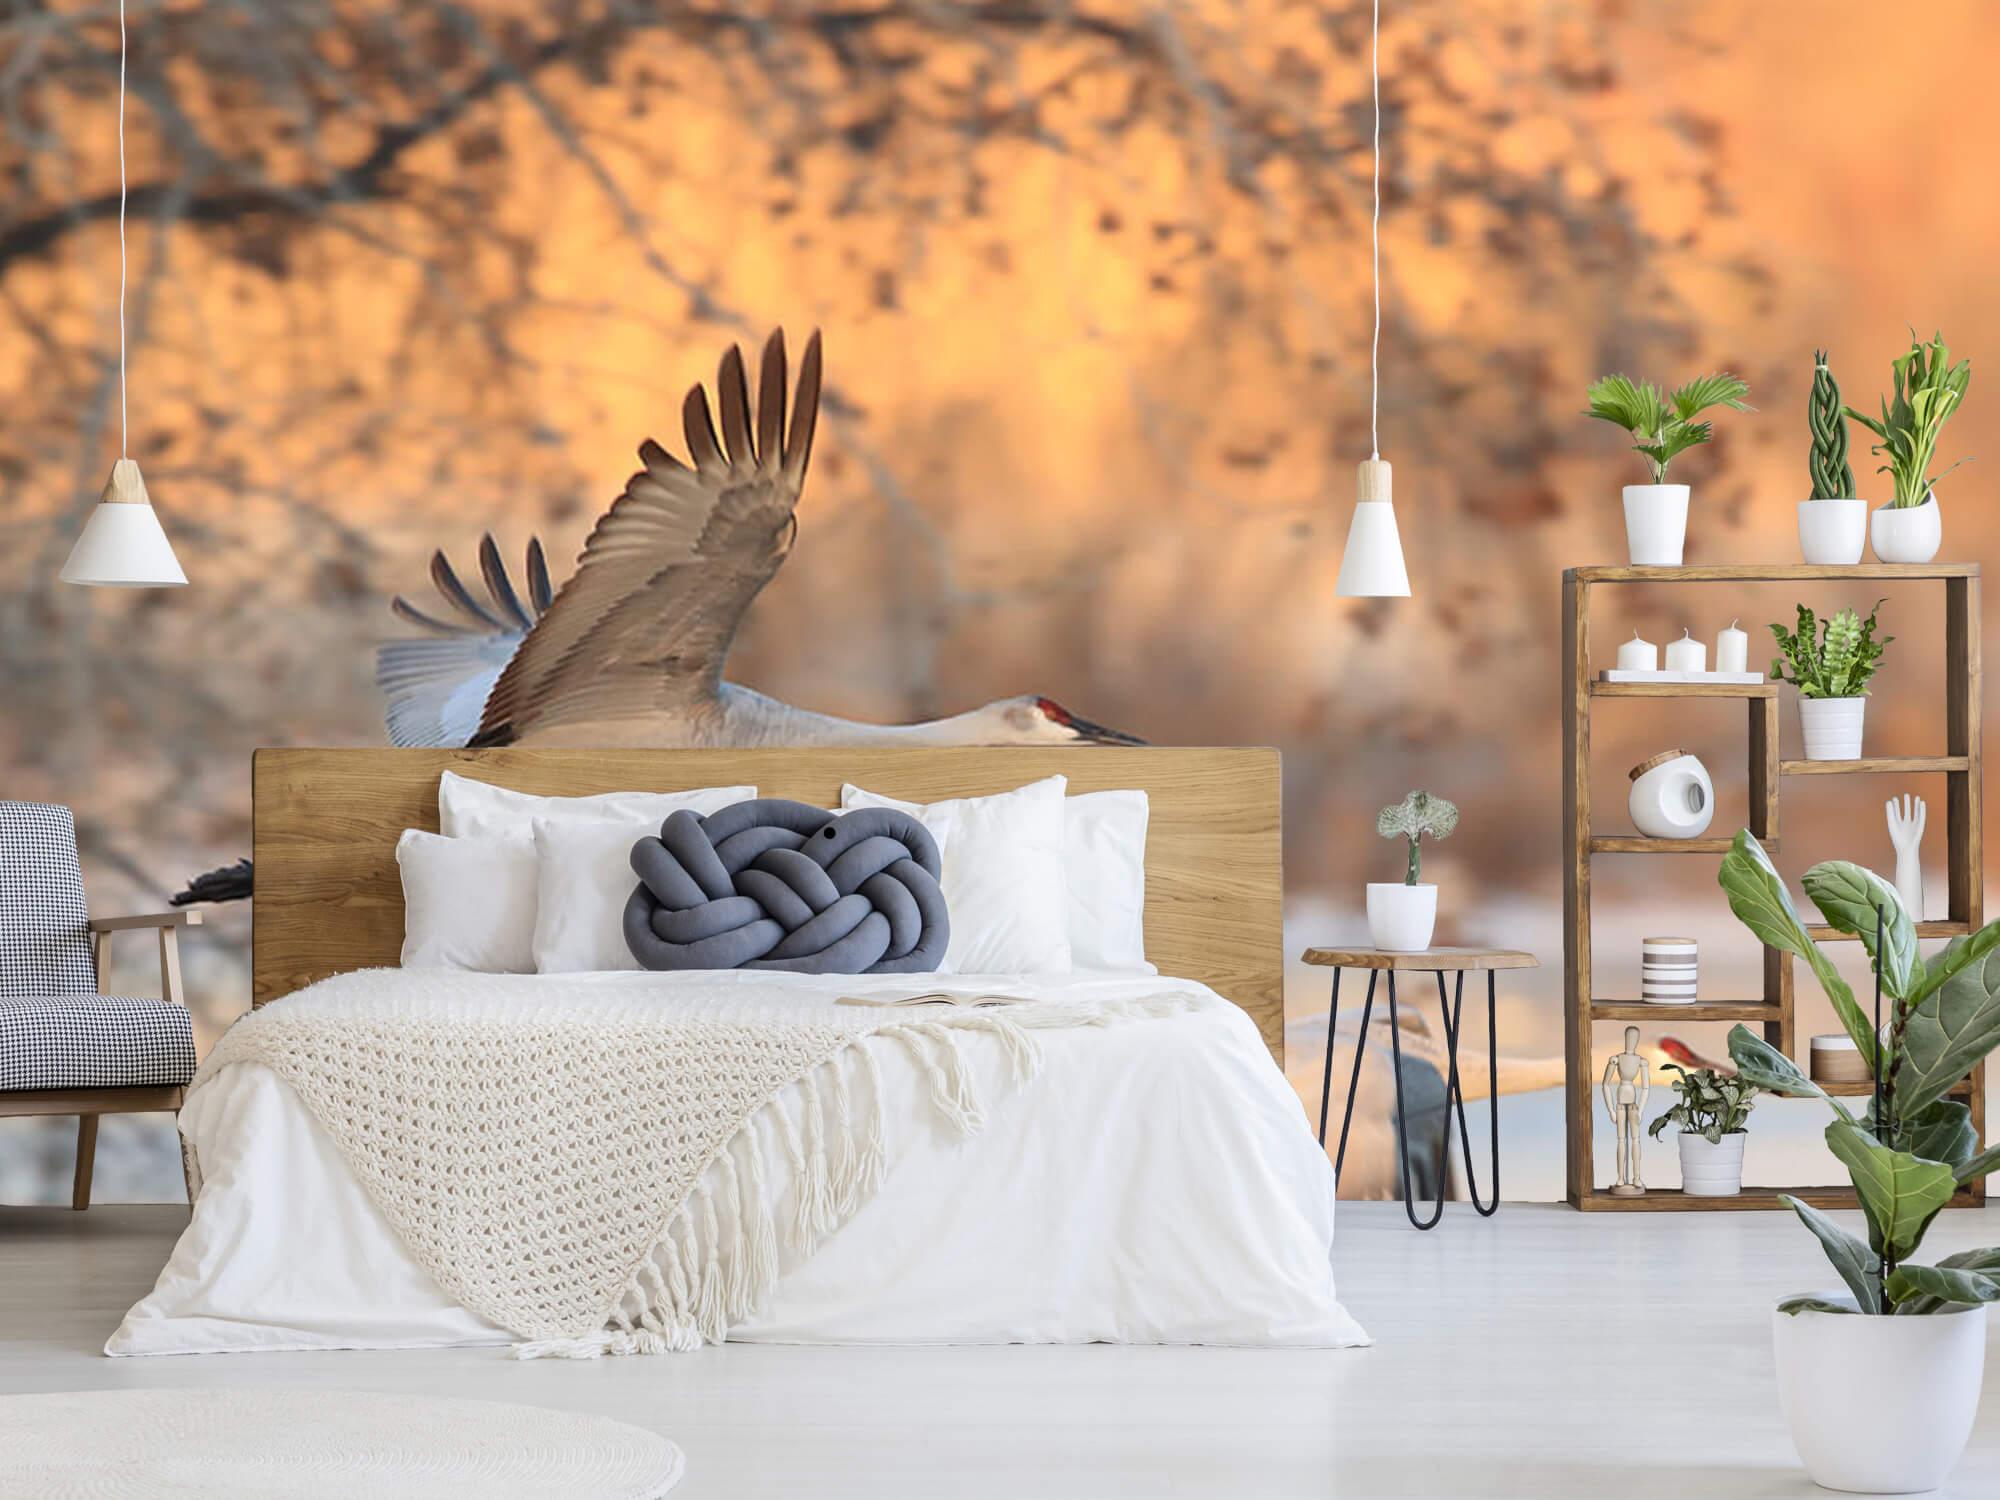 Vliegende kraanvogels 6